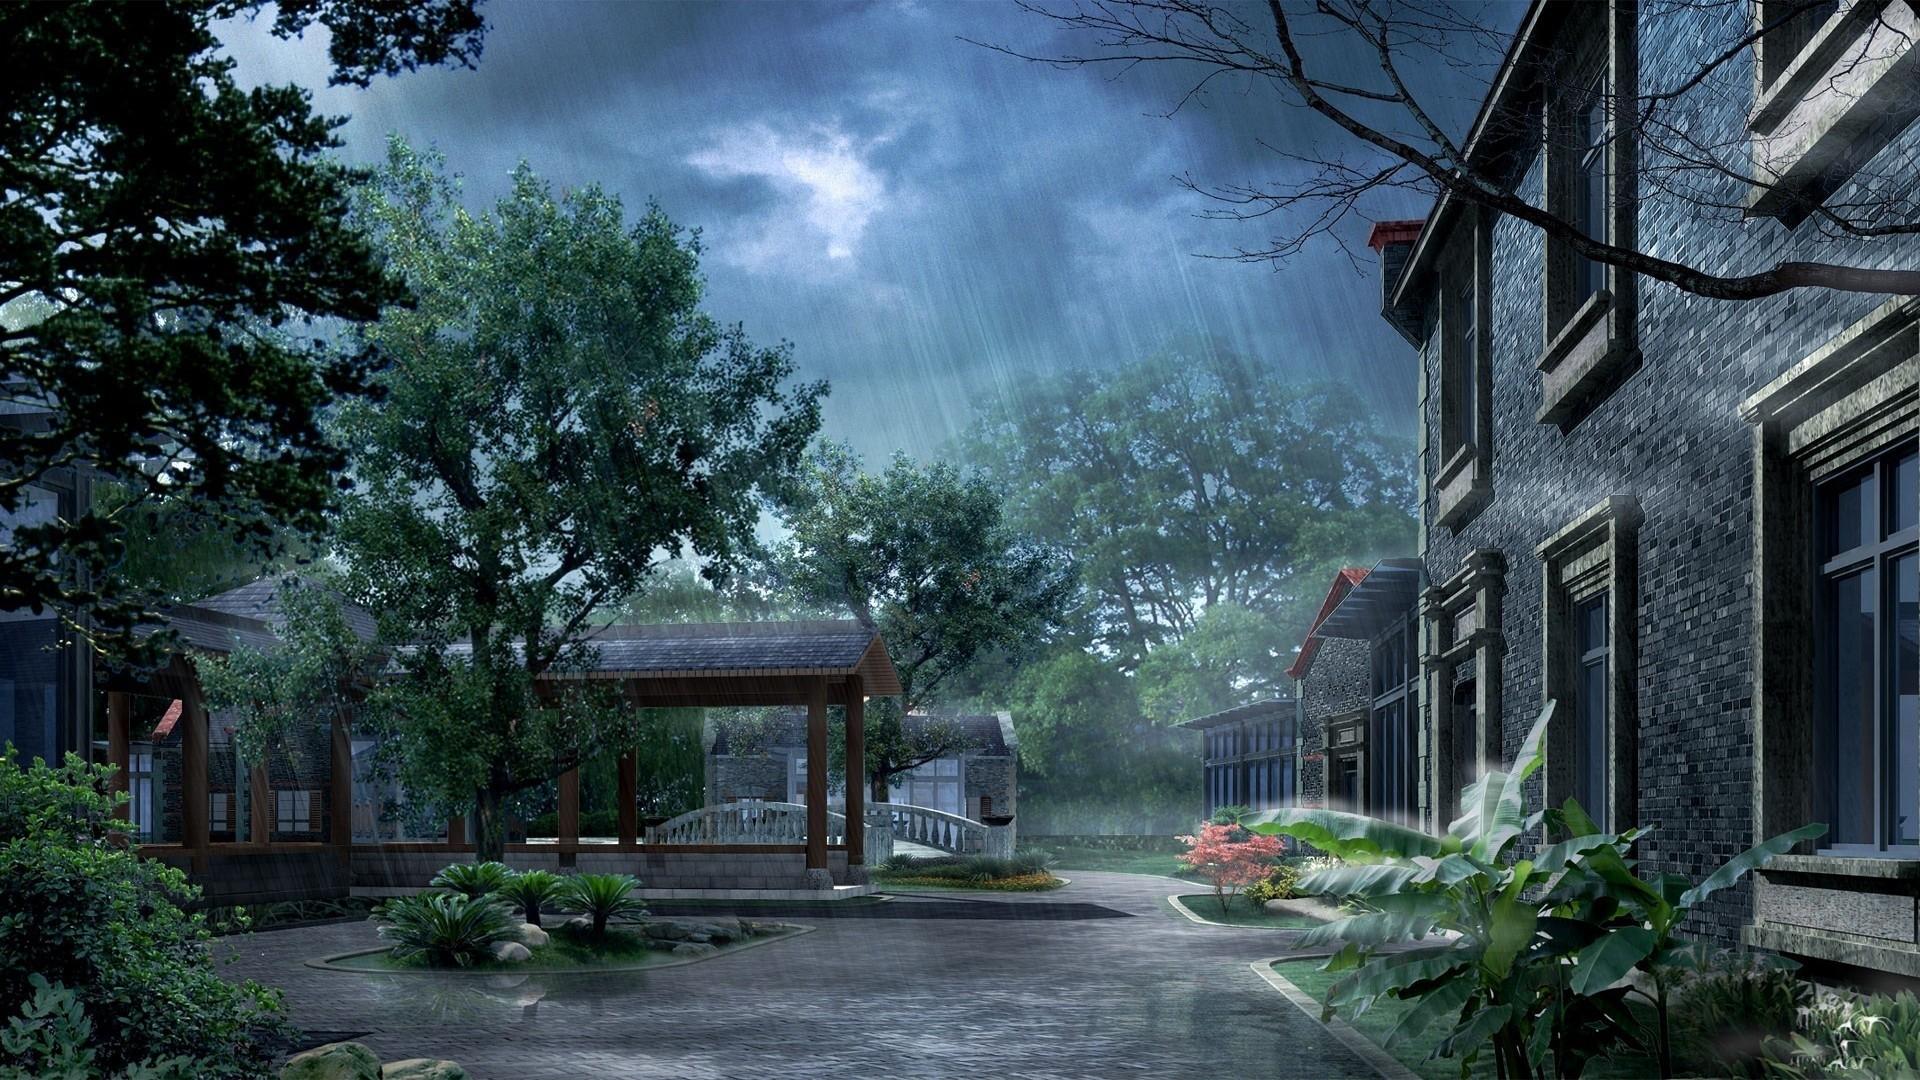 Anime Rain Free Desktop Wallpaper